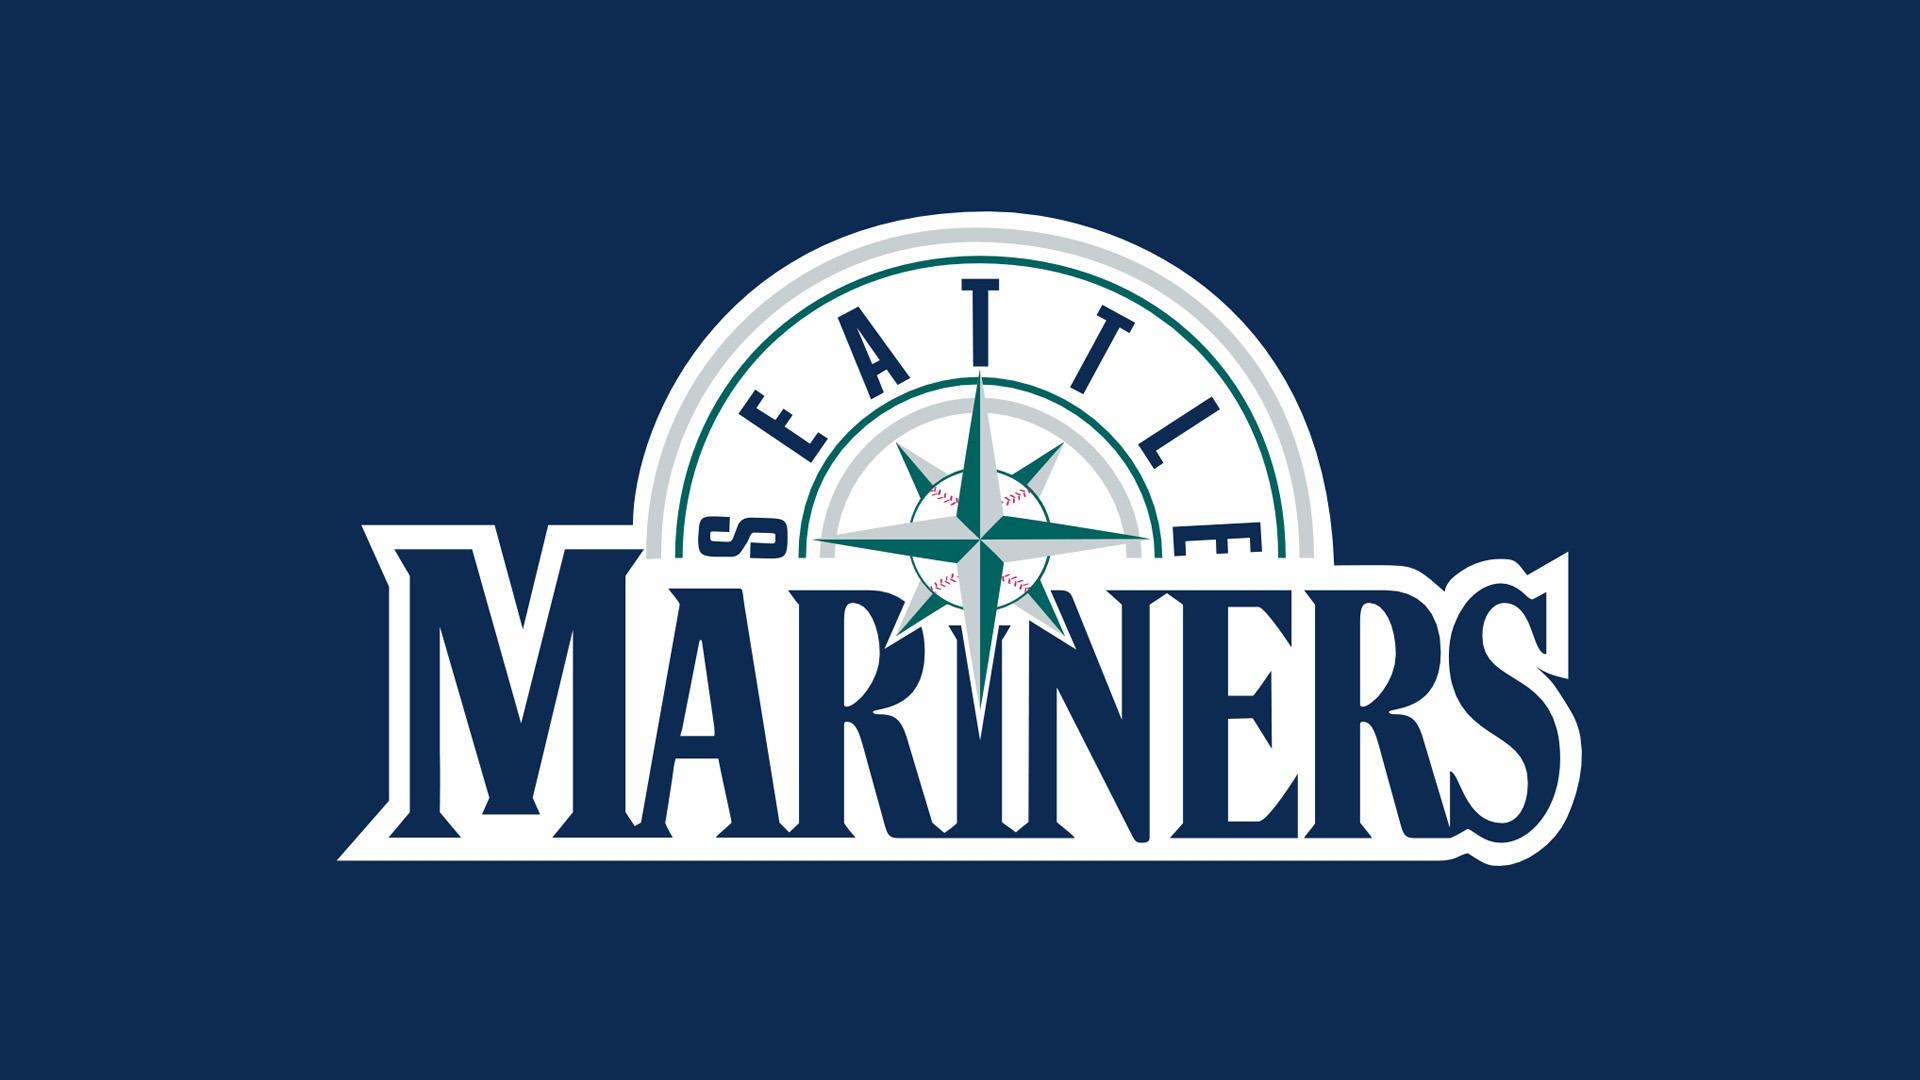 MLB Seattle Mariners Logo 1920x1080 HD MLB Baseball Seattle Mariners 1920x1080